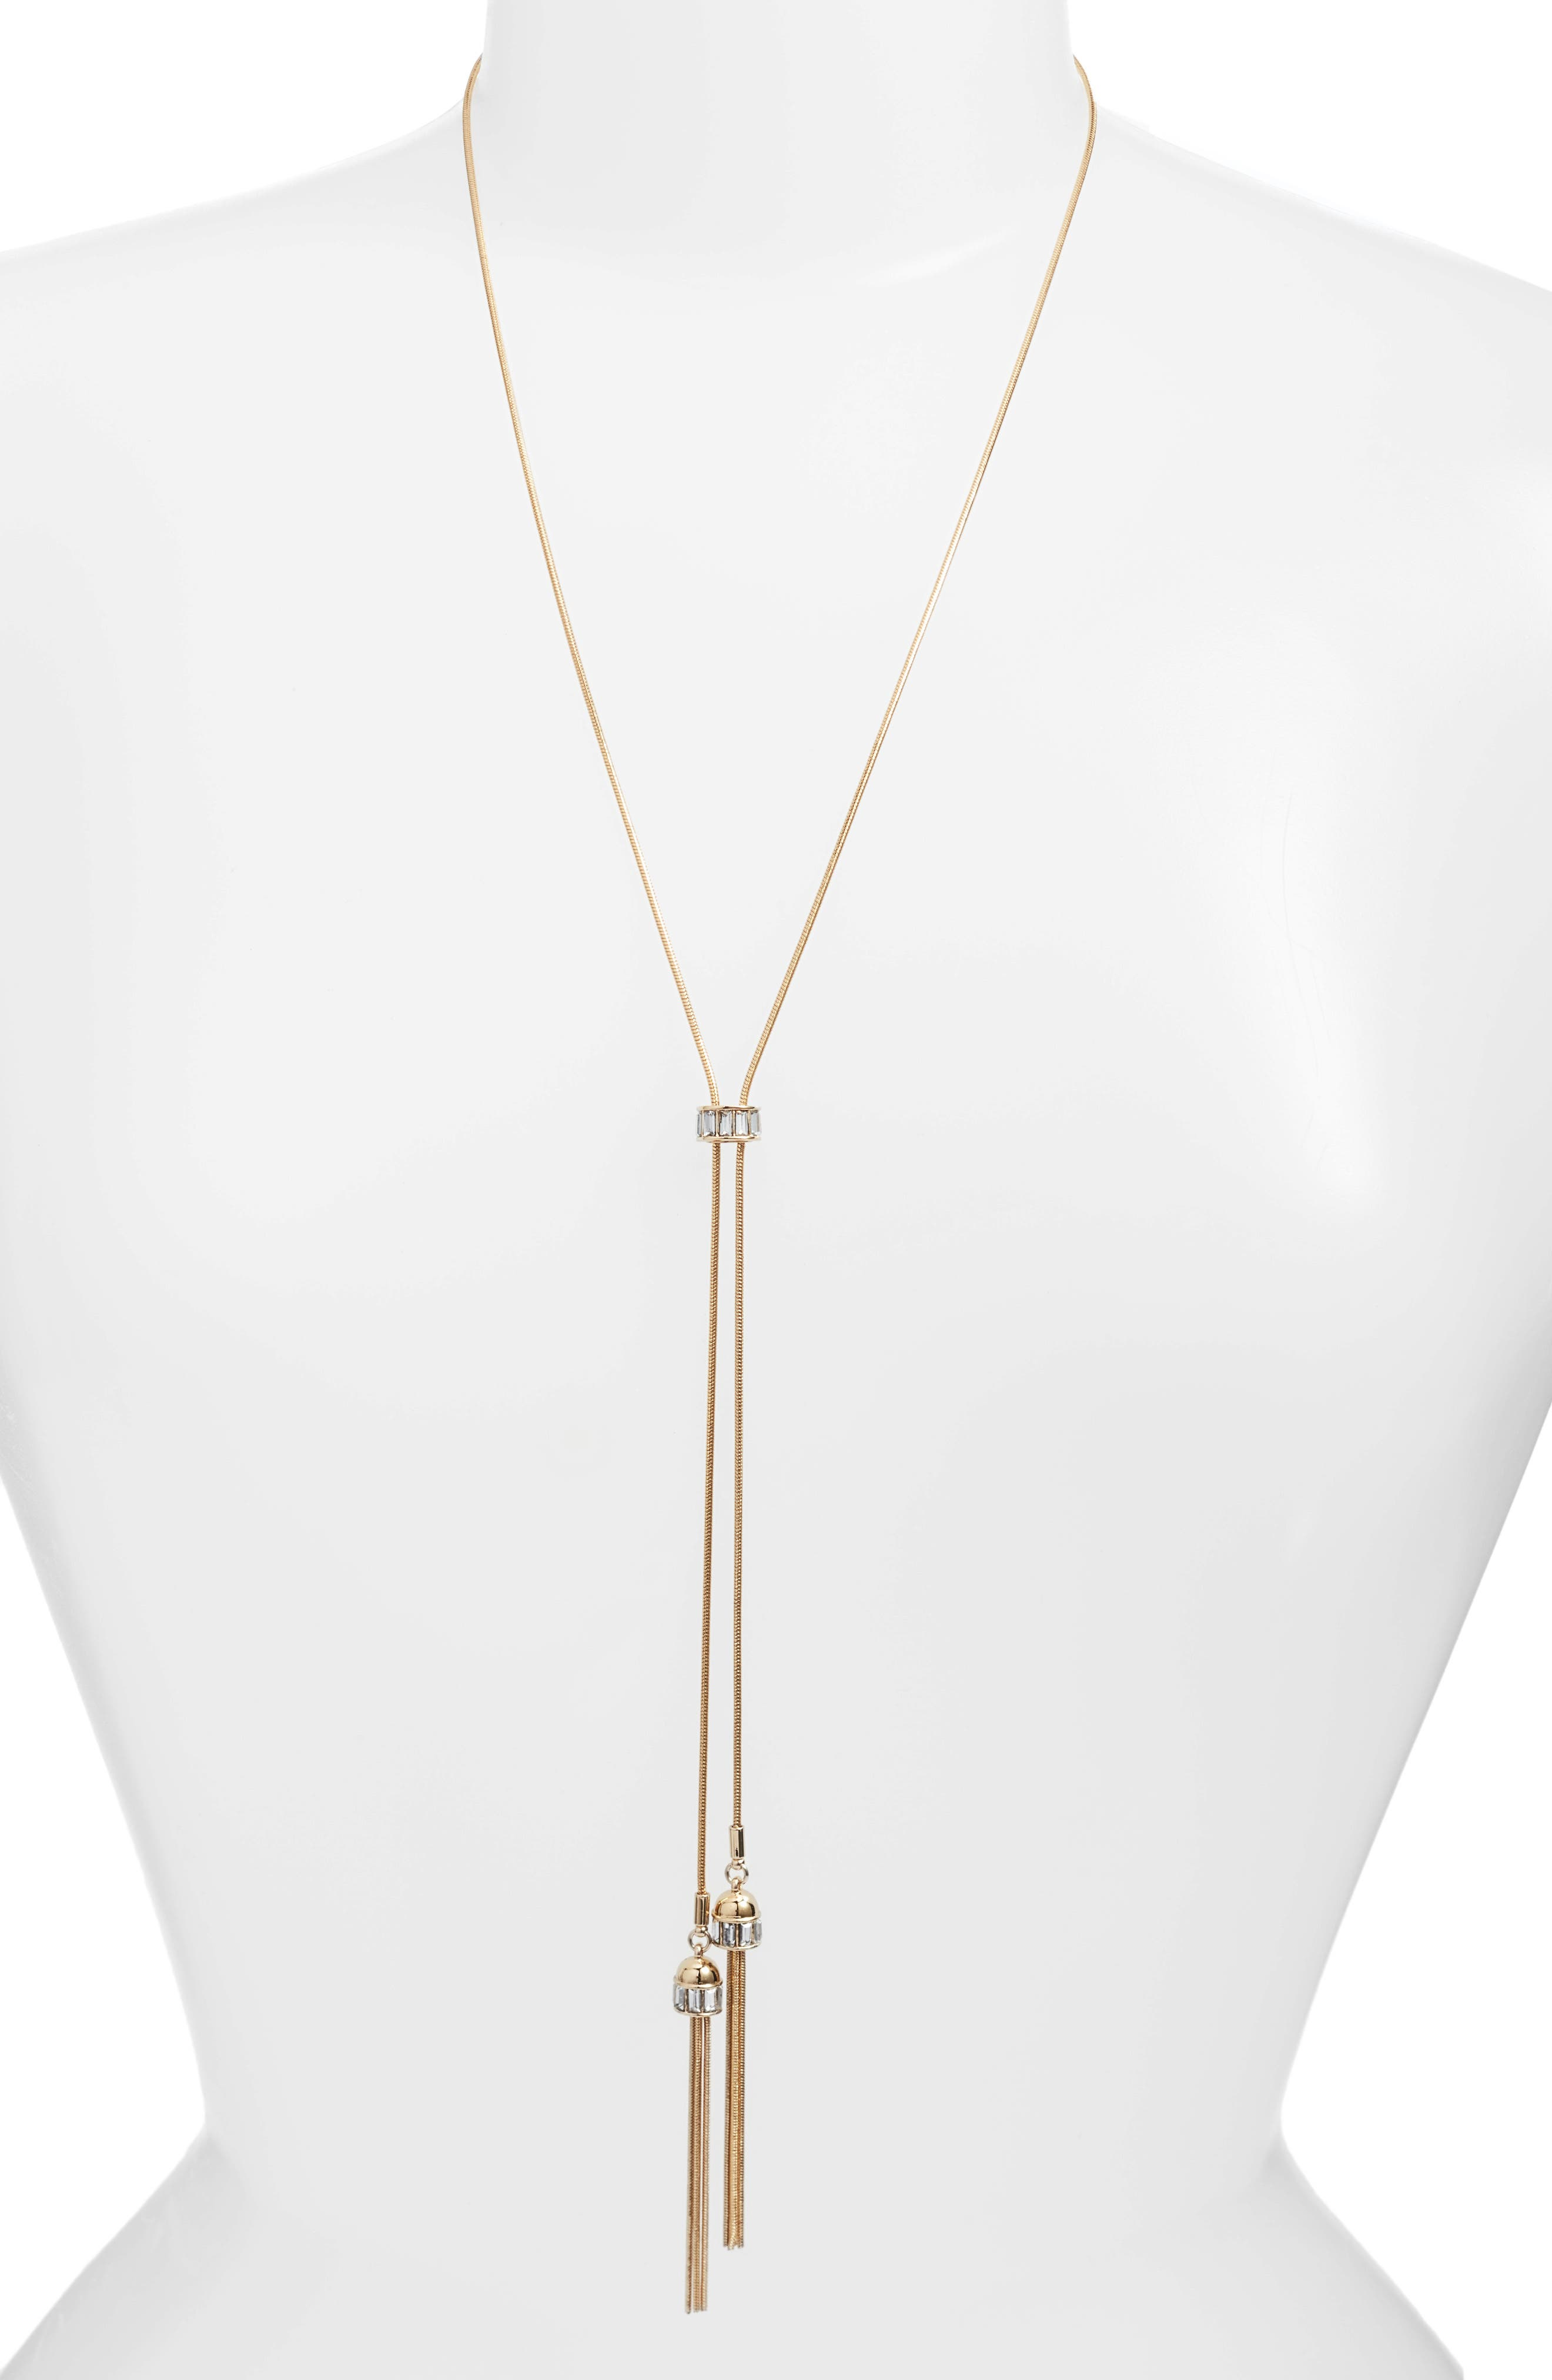 Main Image - Vince Camuto Long Pendant Necklace